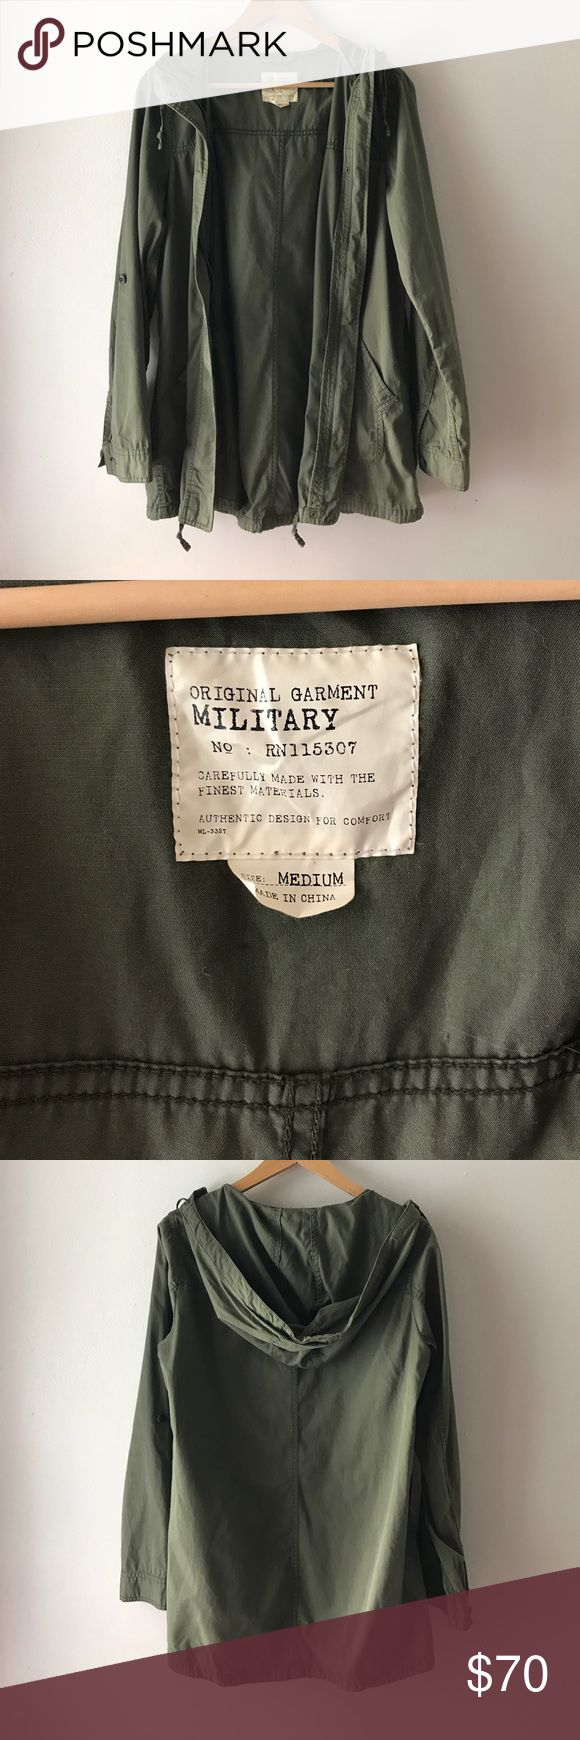 Military jacket Perfect army green jacket Uniqlo Jackets & Coats